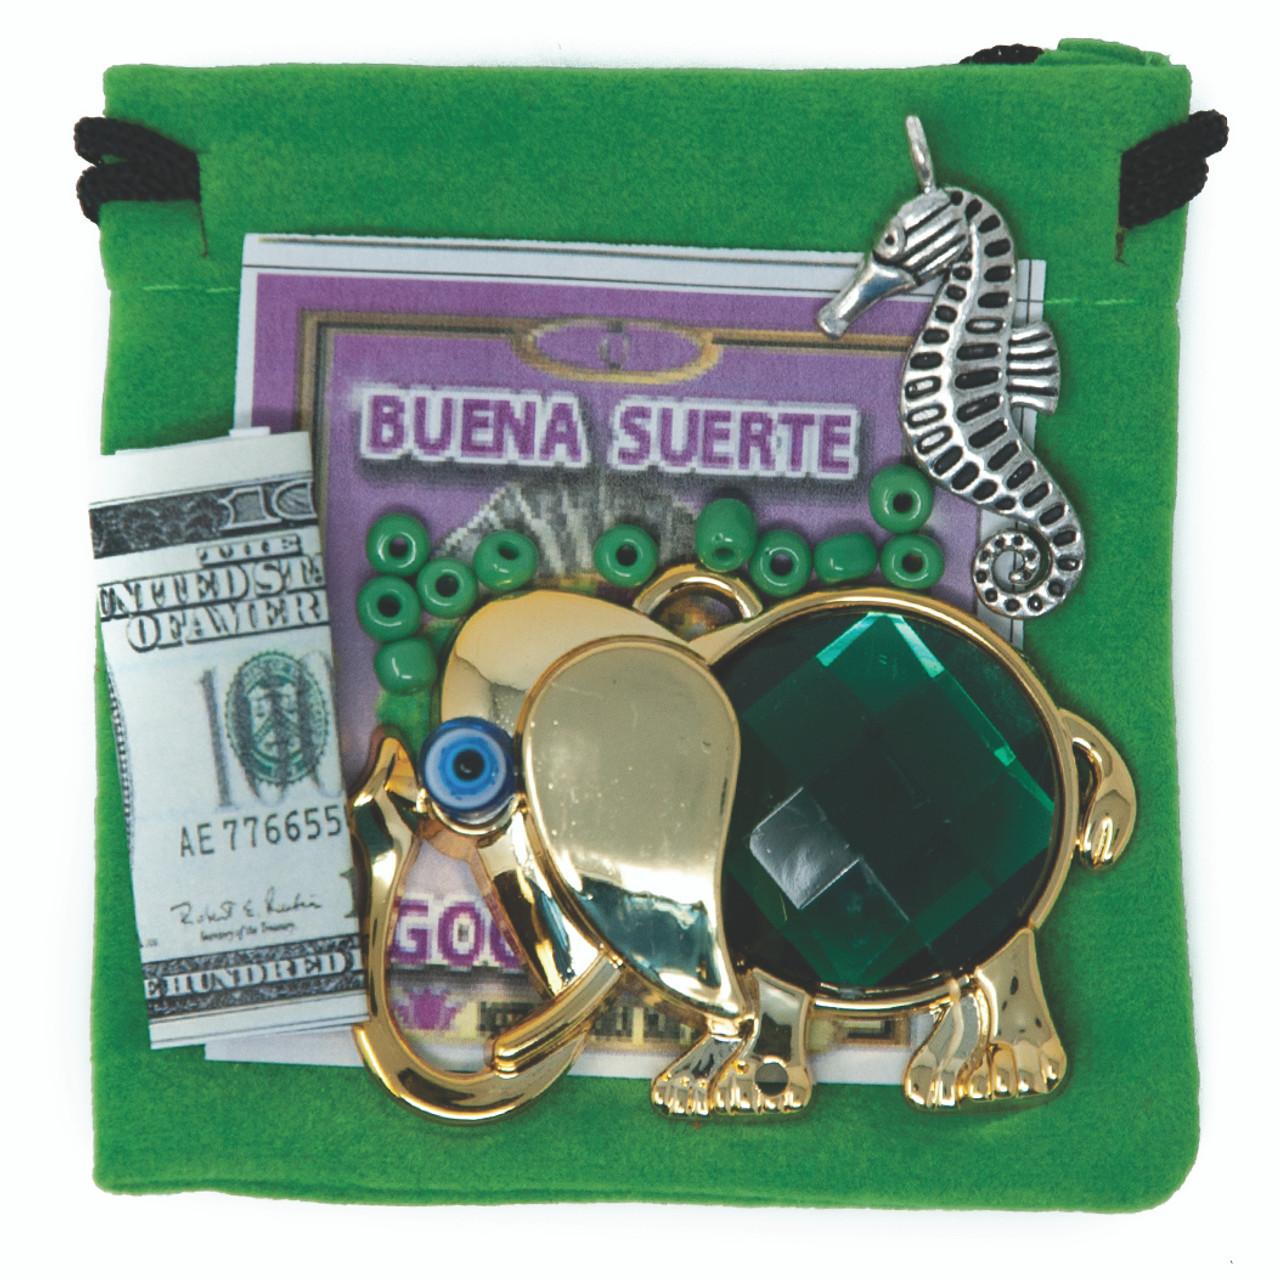 Resguardo Buena Suerte (Good Luck)